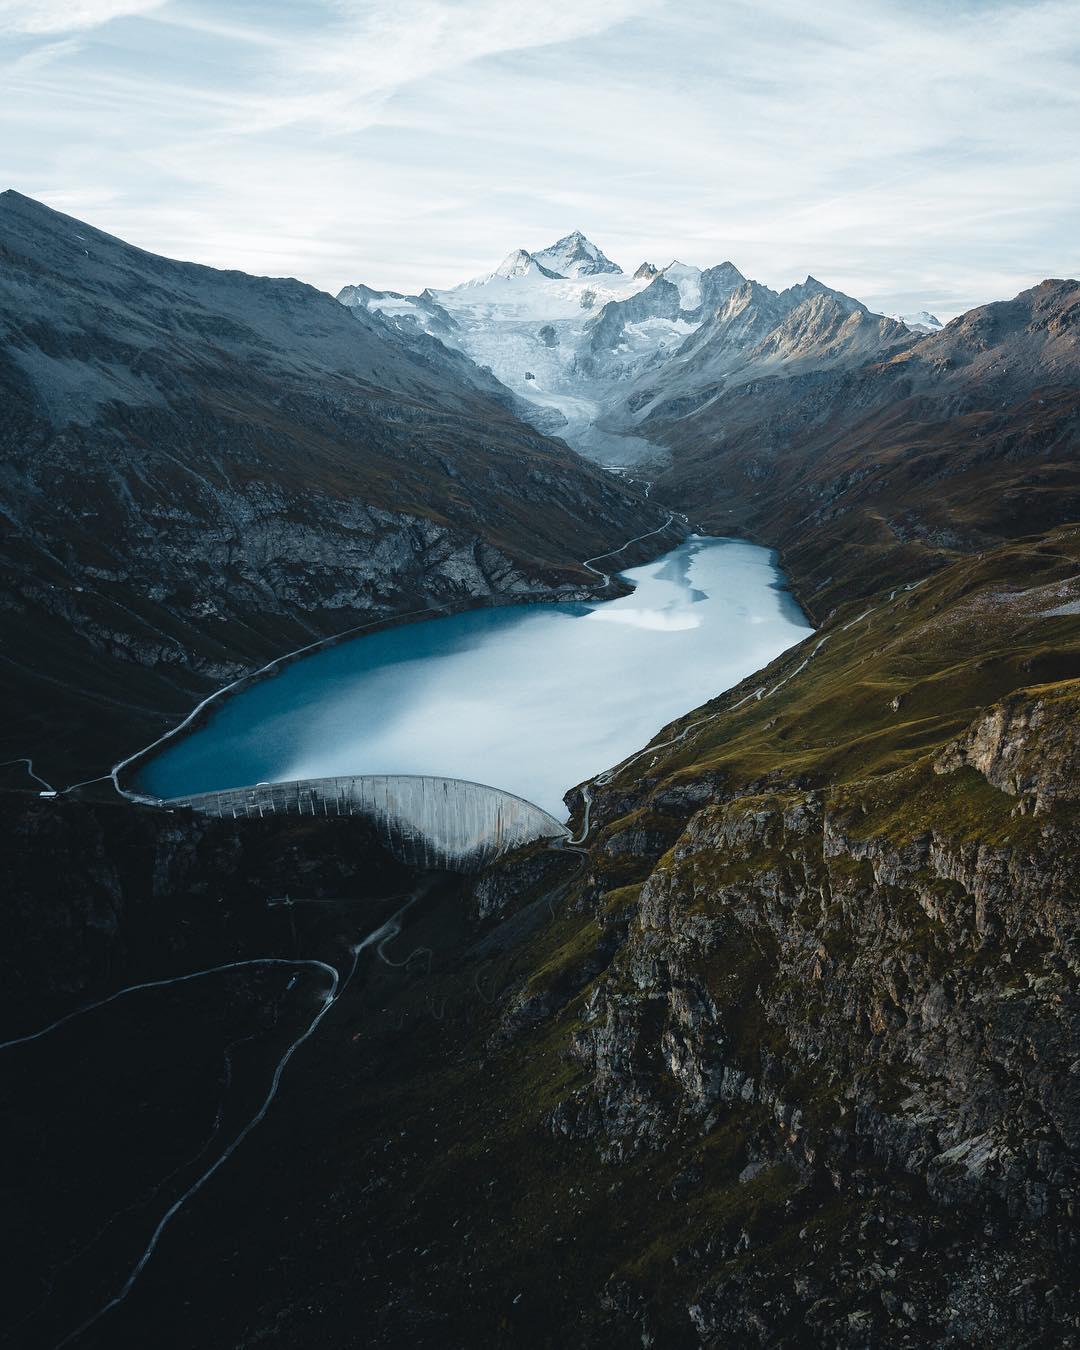 Lac de Moiry drone photo